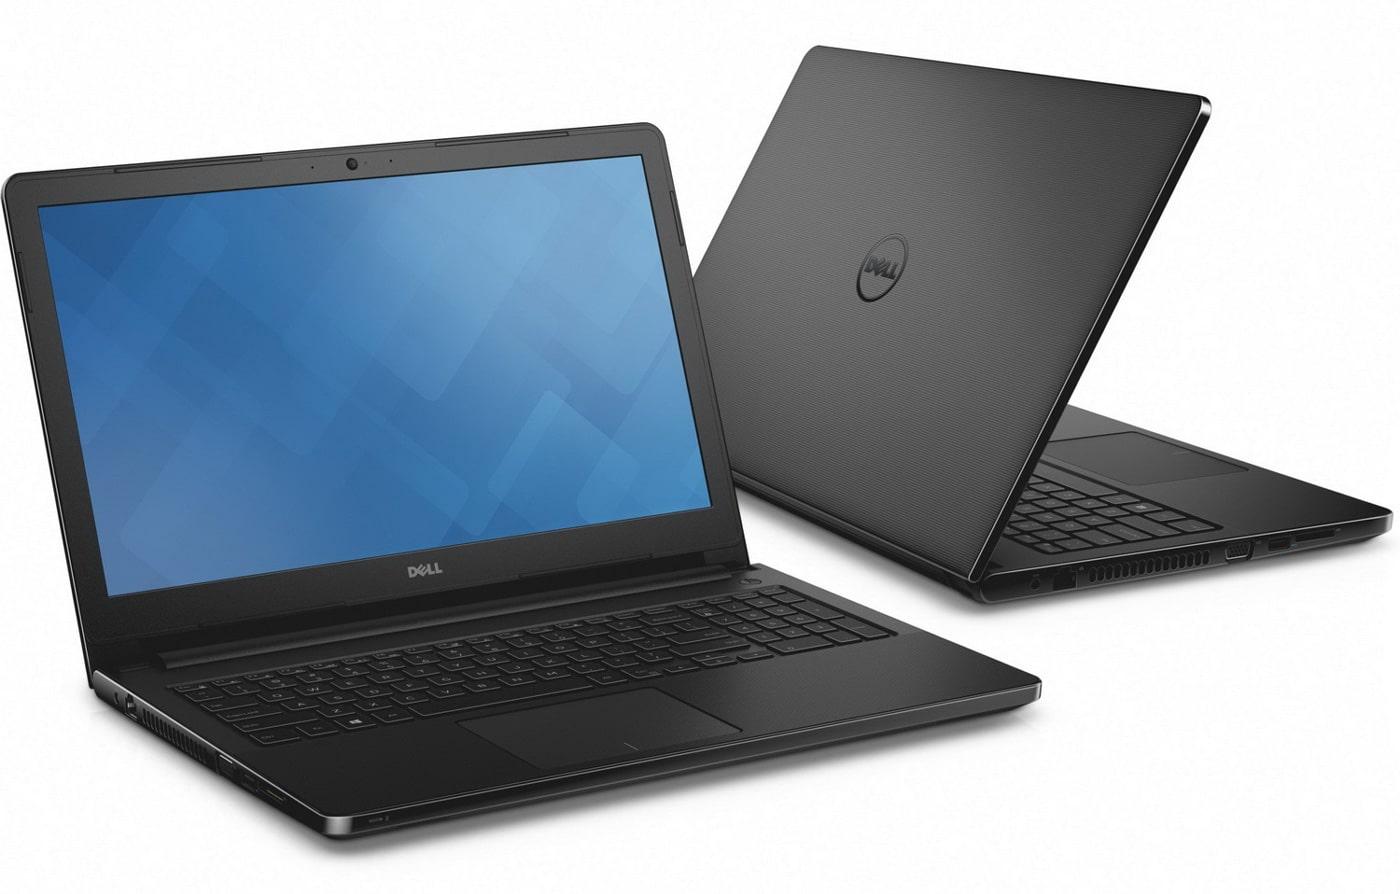 Dell Vostro 3559-11G85 à 549€, PC portable 15 pouces mat Pro Core i5 Skylake